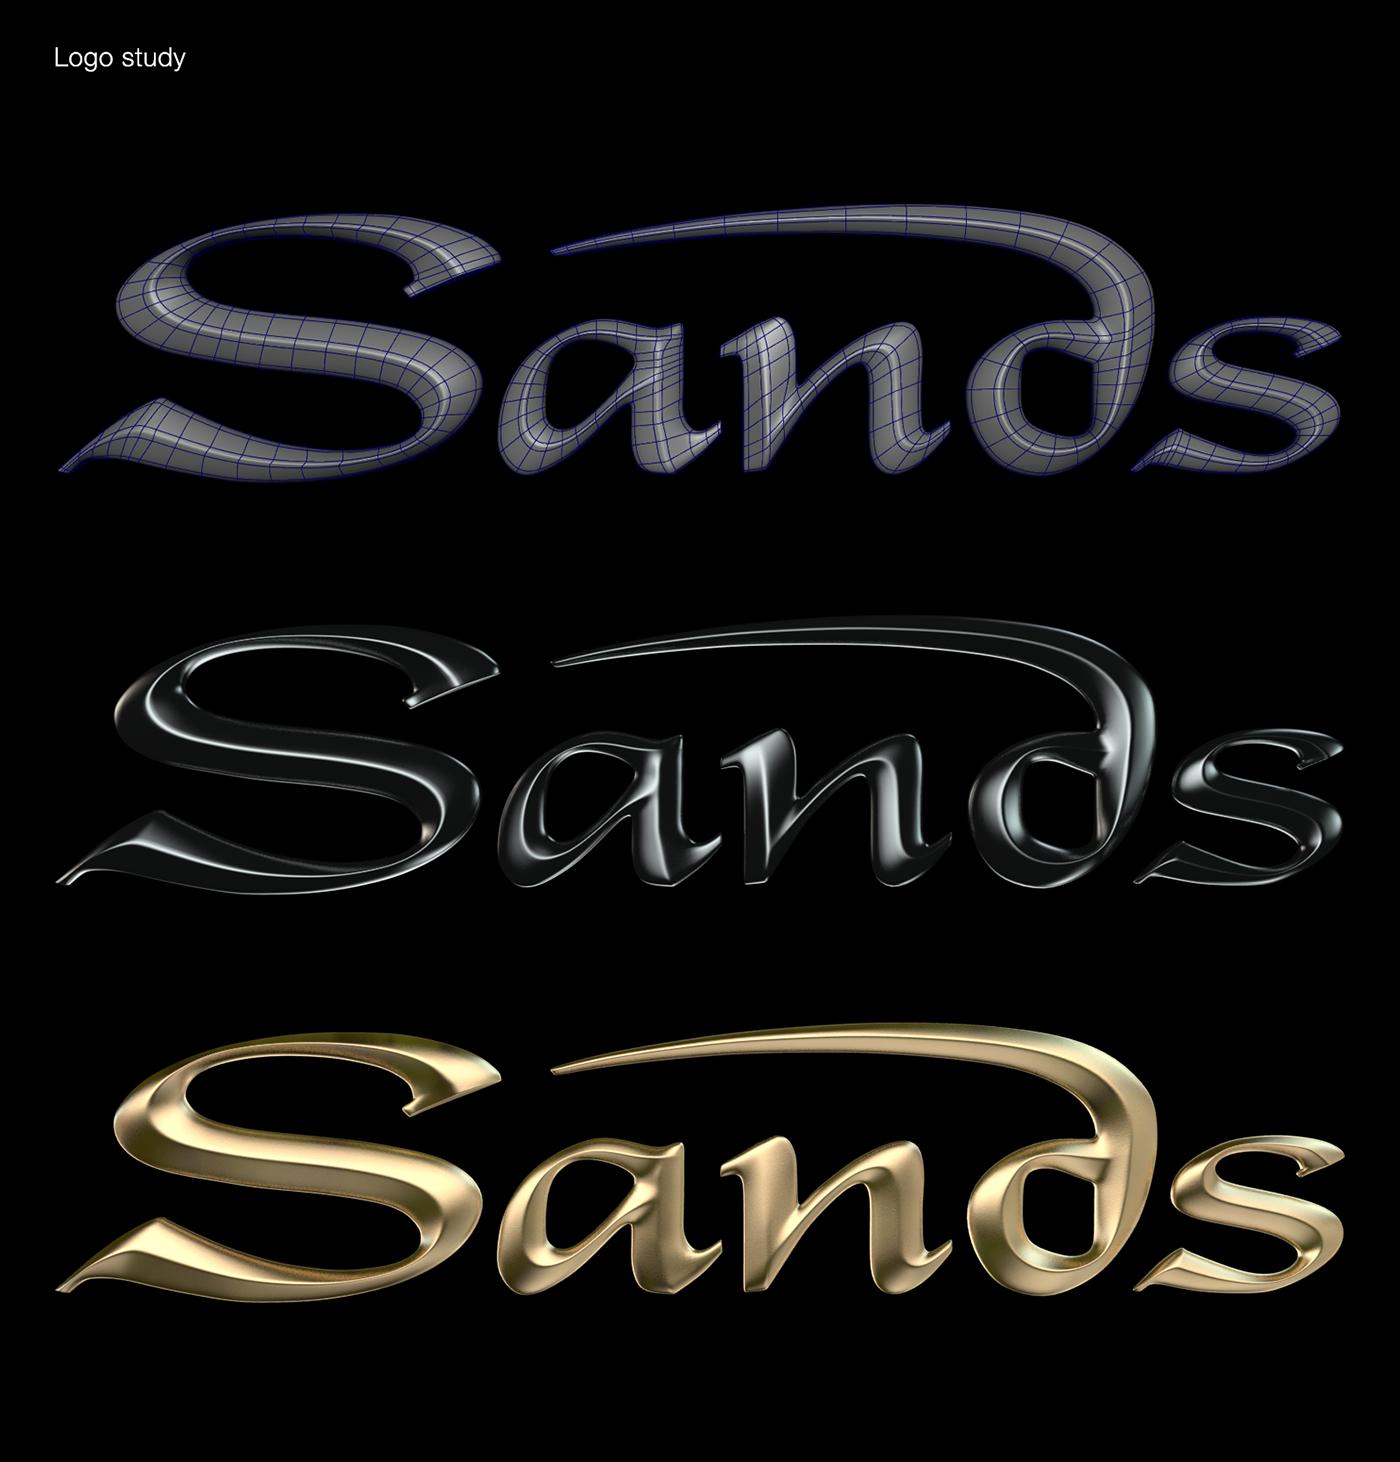 MBS,marina,Bay Sands,3D,Maya,animation ,logo,arnold